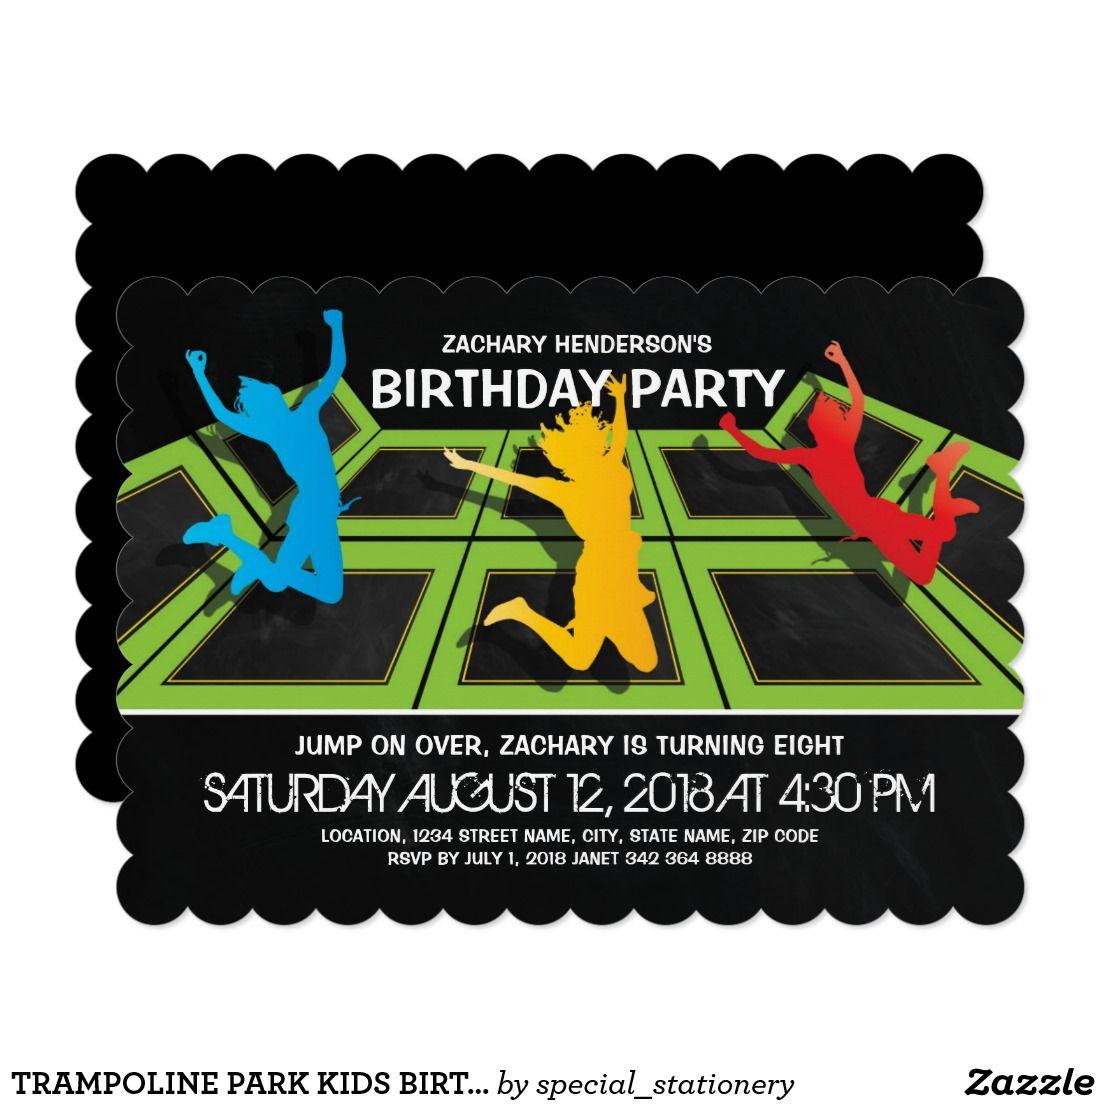 Trampoline Park Kids Birthday Party Invitation Zazzle